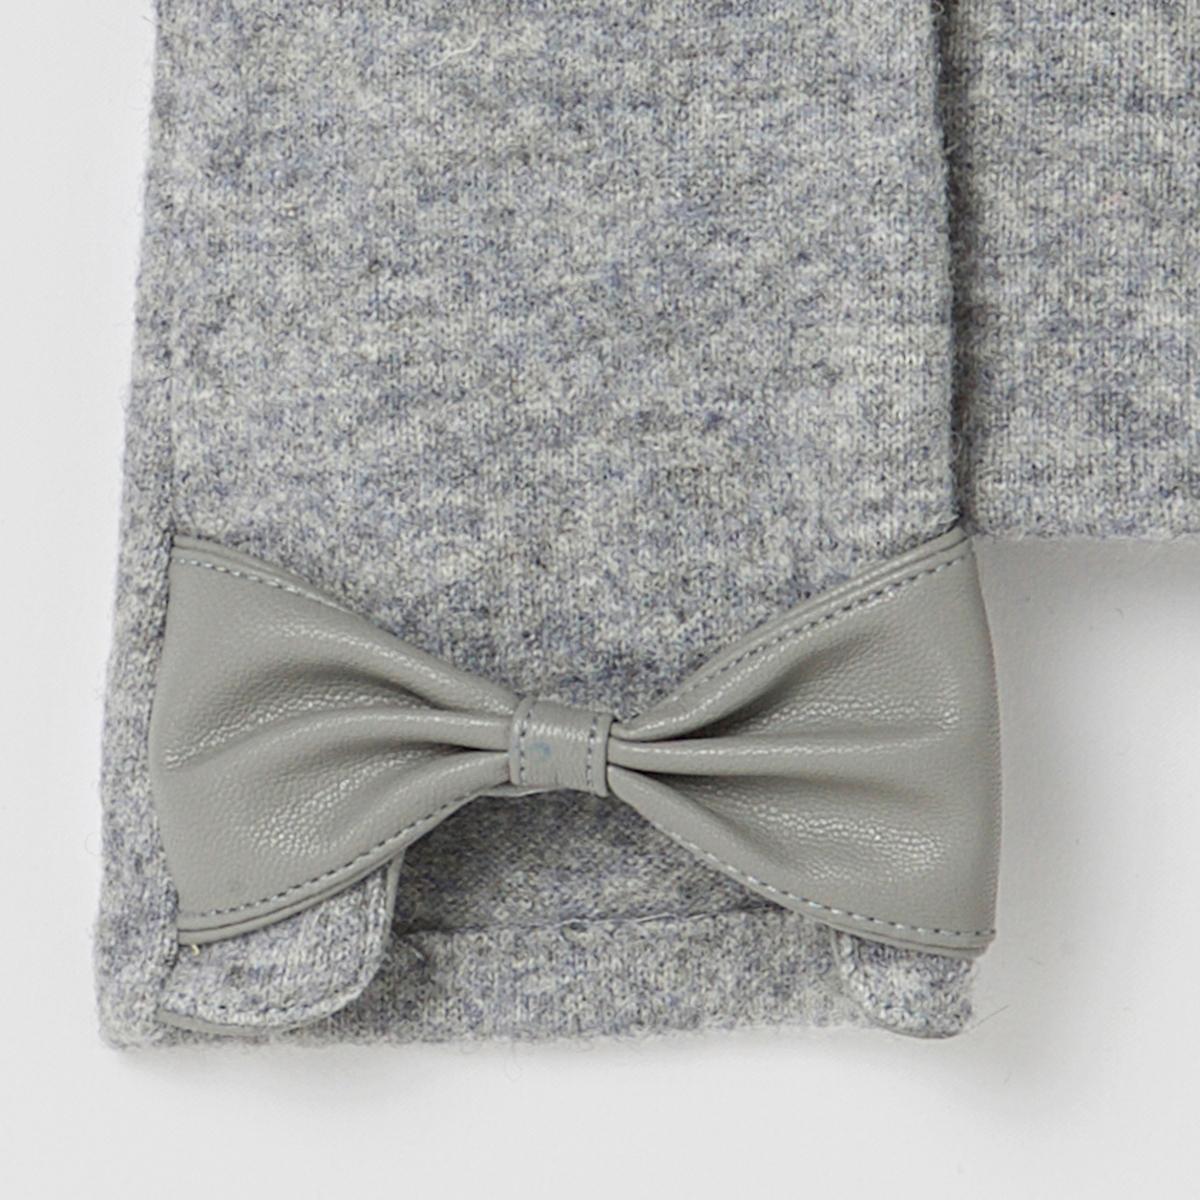 Перчатки - Atelier RПерчатки Atelier RМатериал: 80% полиэстера, 20% шерсти<br><br>Цвет: серый